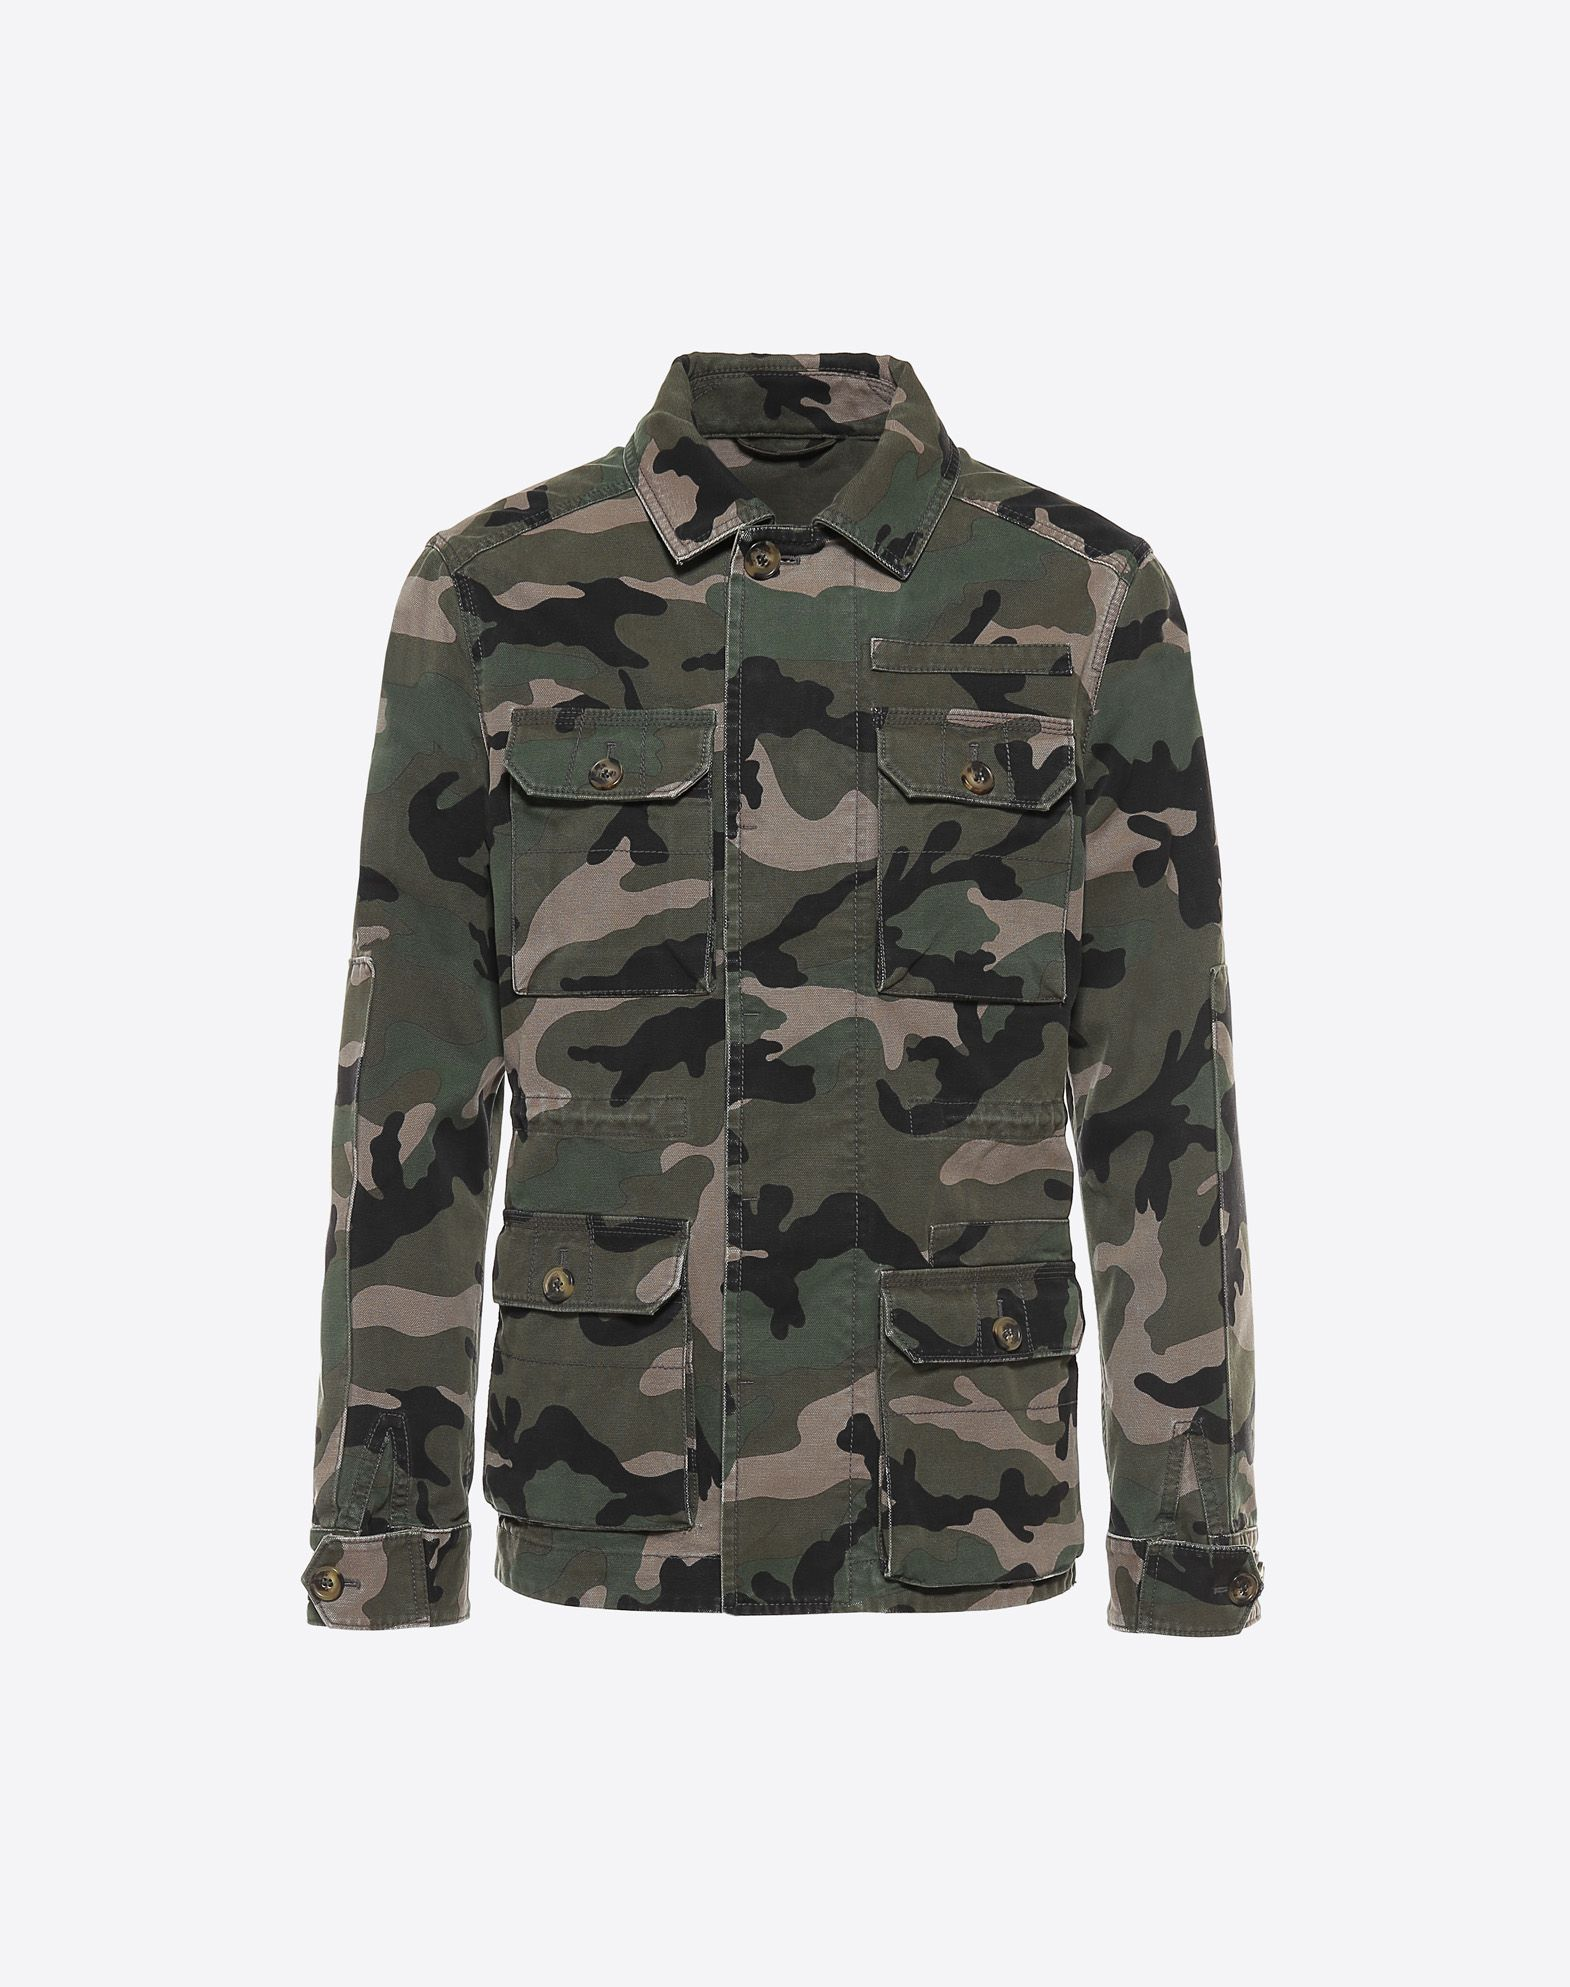 VALENTINO Canvas Camouflage design Print Four pockets Hidden buttons  41690695go